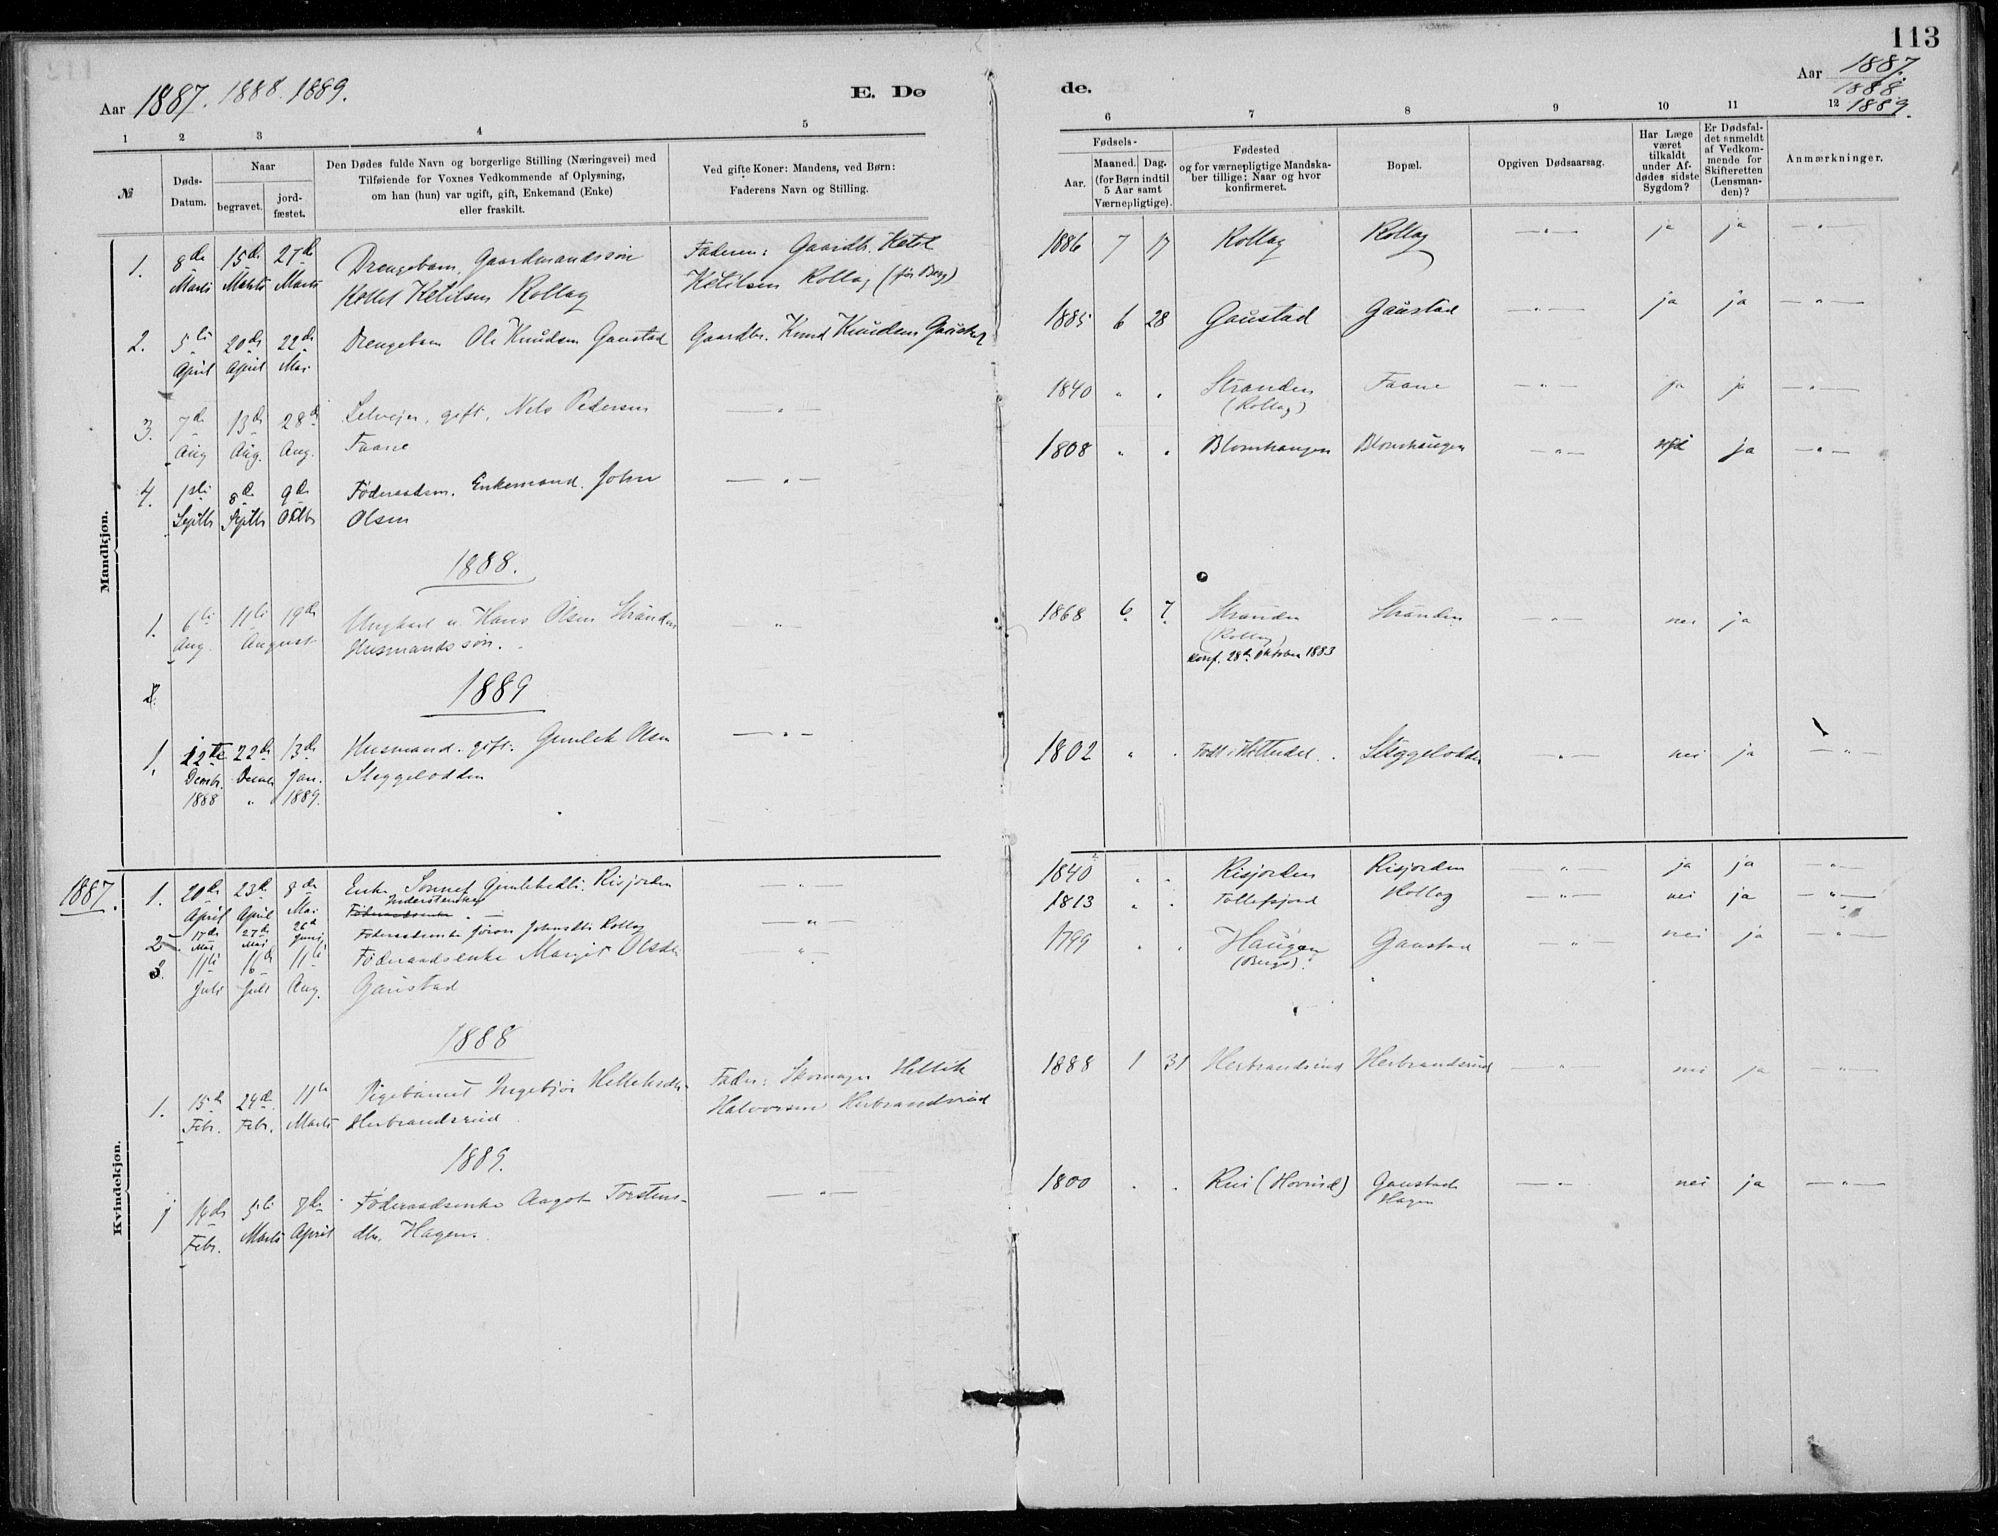 SAKO, Tinn kirkebøker, F/Fb/L0002: Ministerialbok nr. II 2, 1878-1917, s. 113